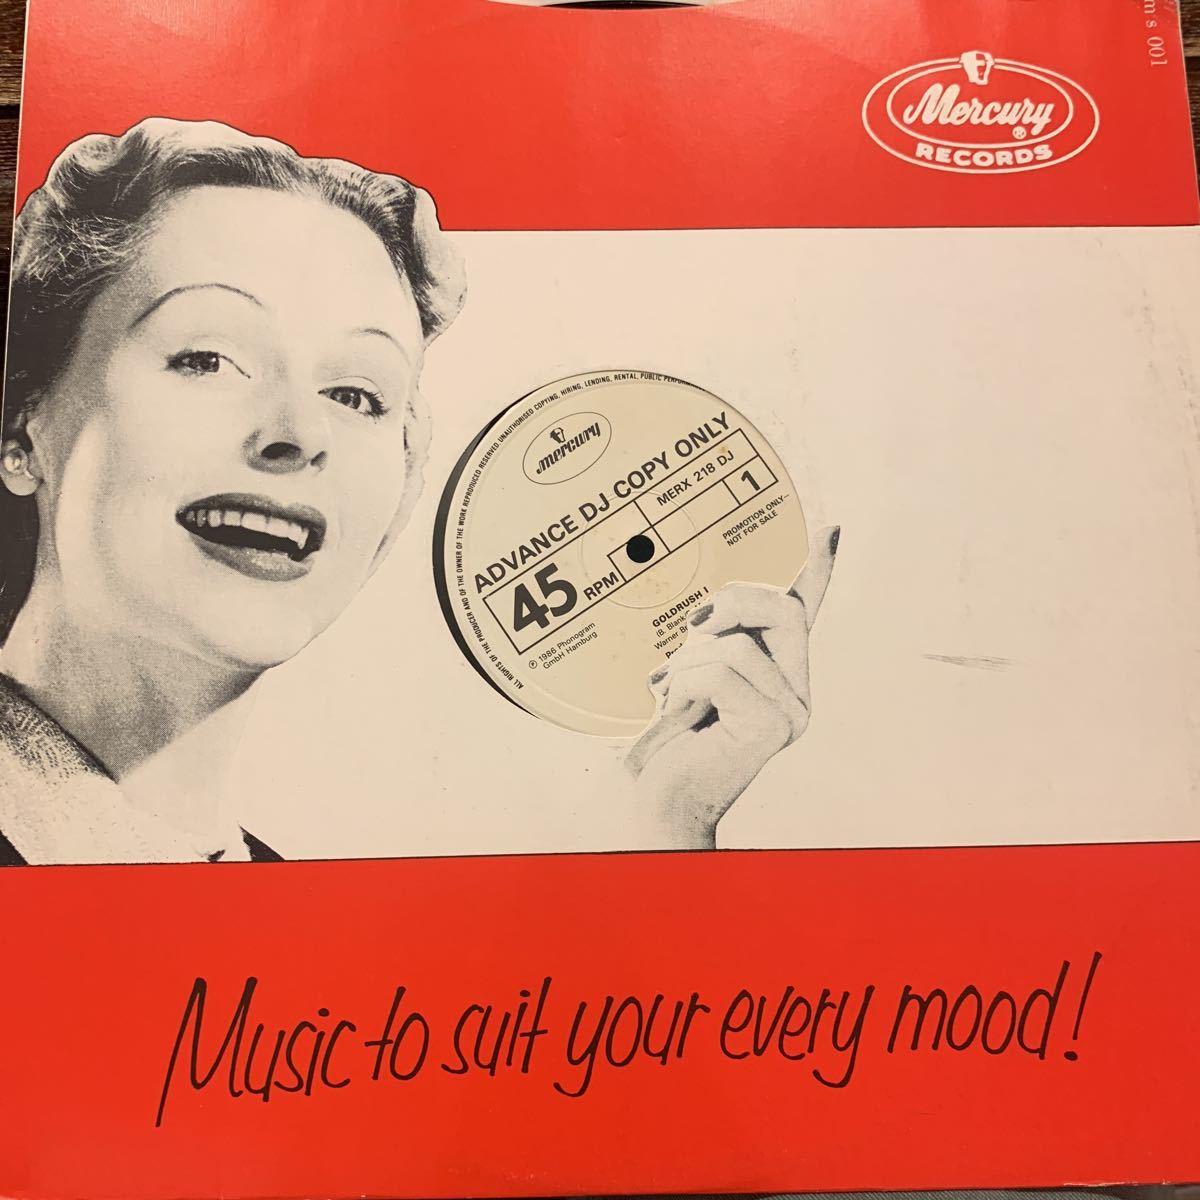 YELLO /GOLD RUSH 中古レコード プロモ盤_画像2